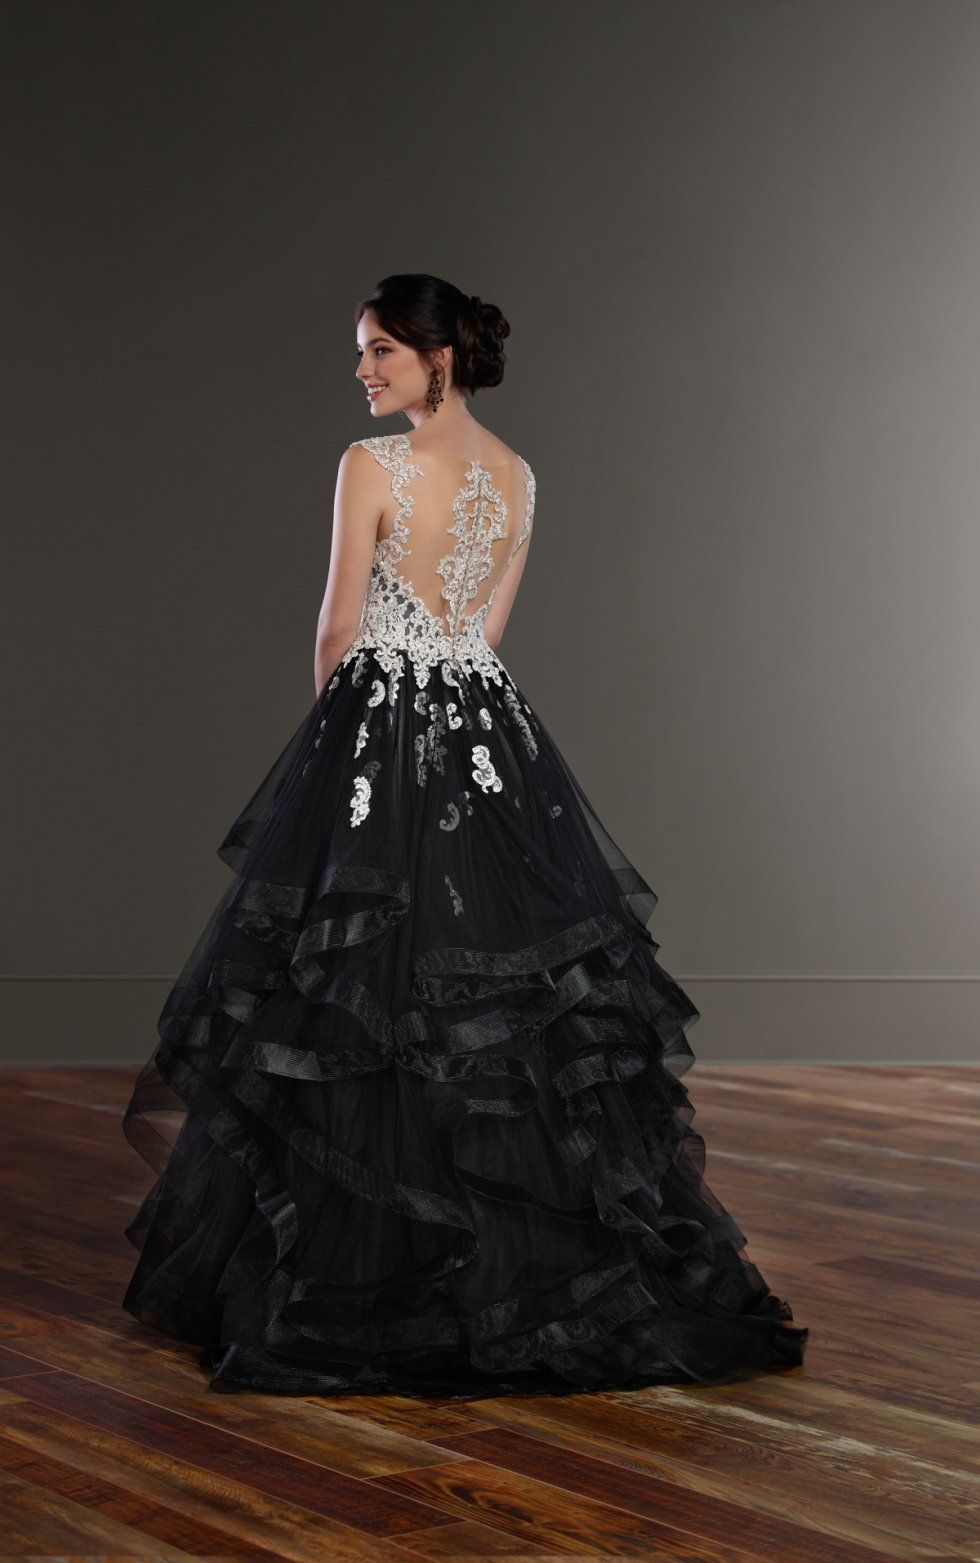 Wedding Gowns Black Princess Wedding Dress Martina Liana Black Wedding Dresses Glam Wedding Dress Wedding Dresses Unique [ 1563 x 980 Pixel ]